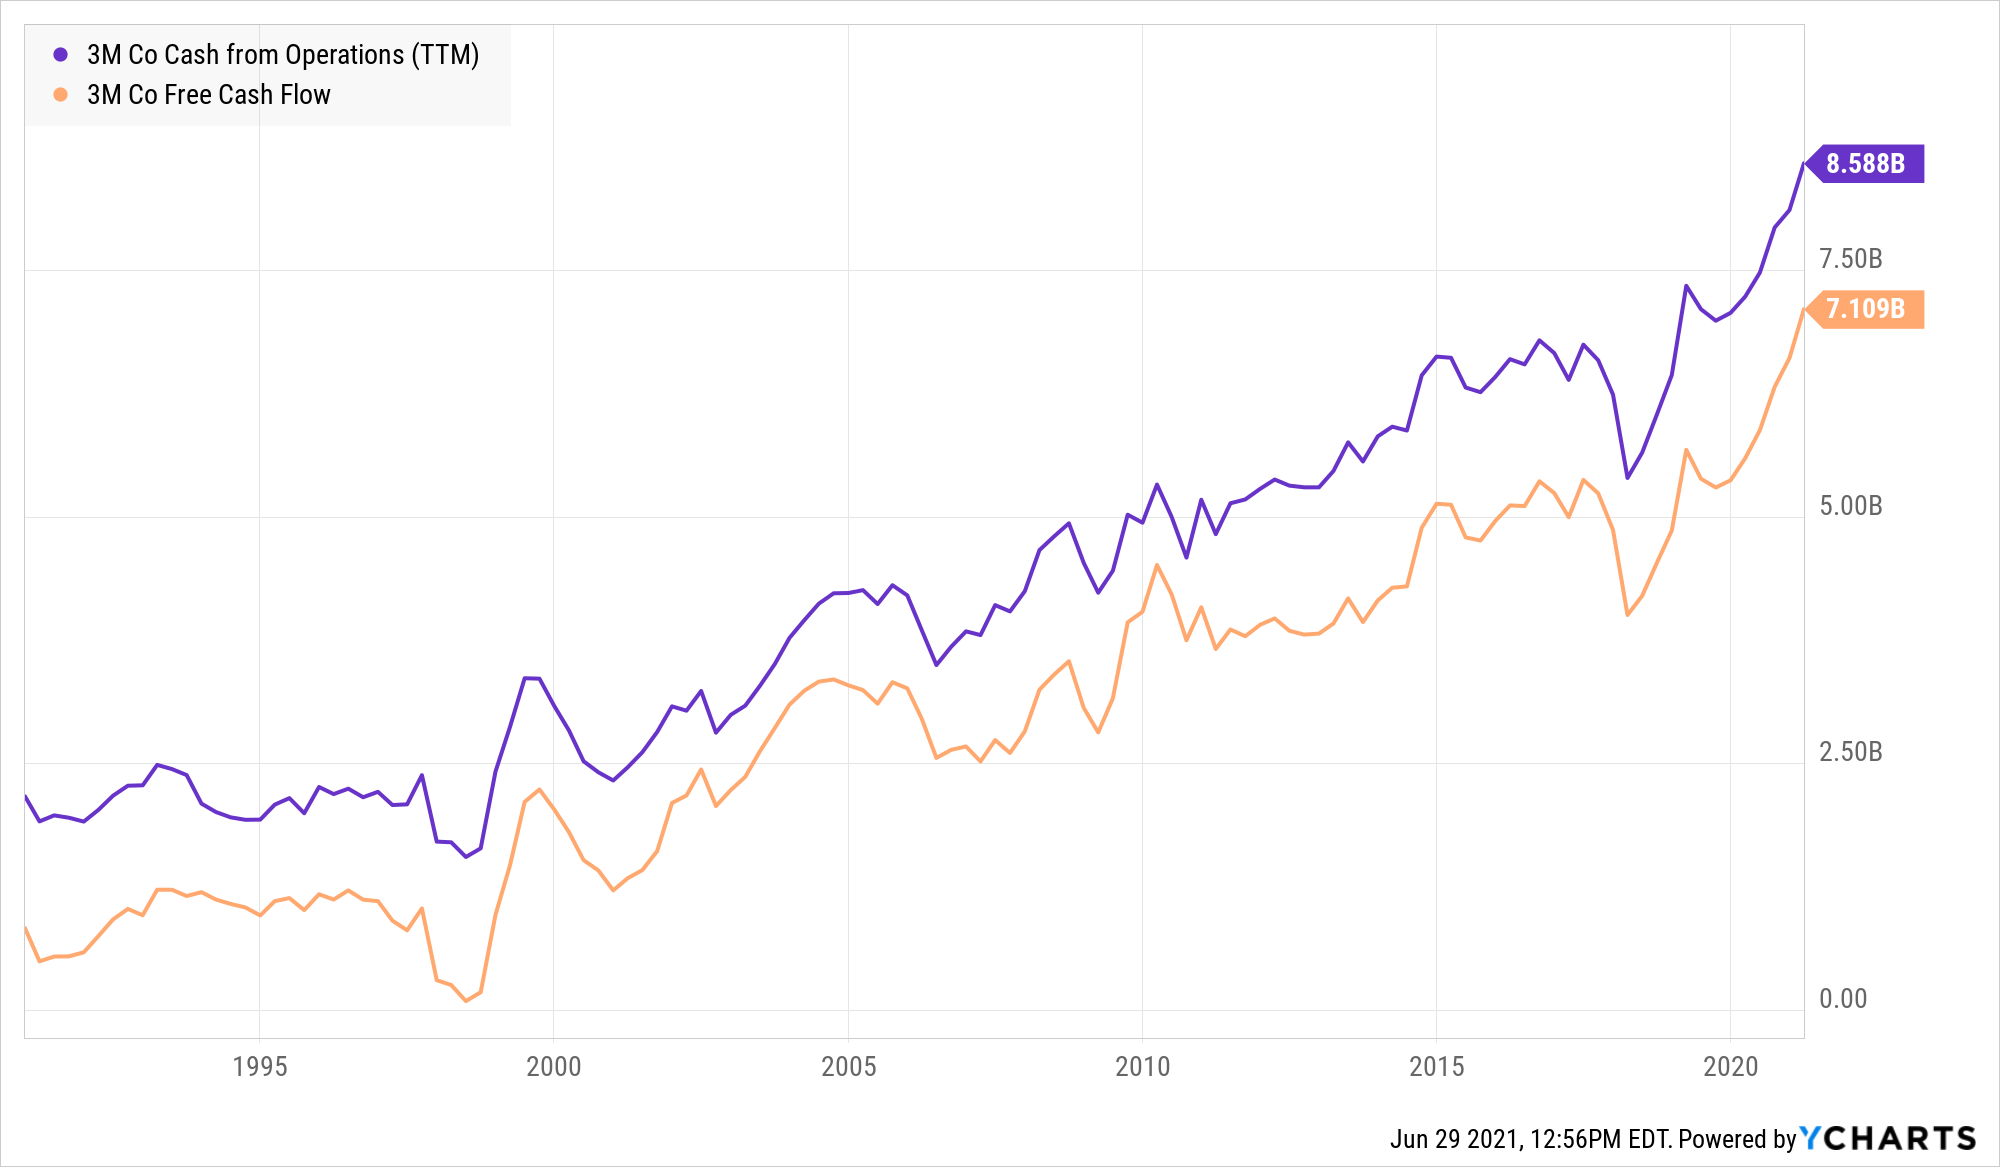 MMM Cash from Operations (TTM) Chart